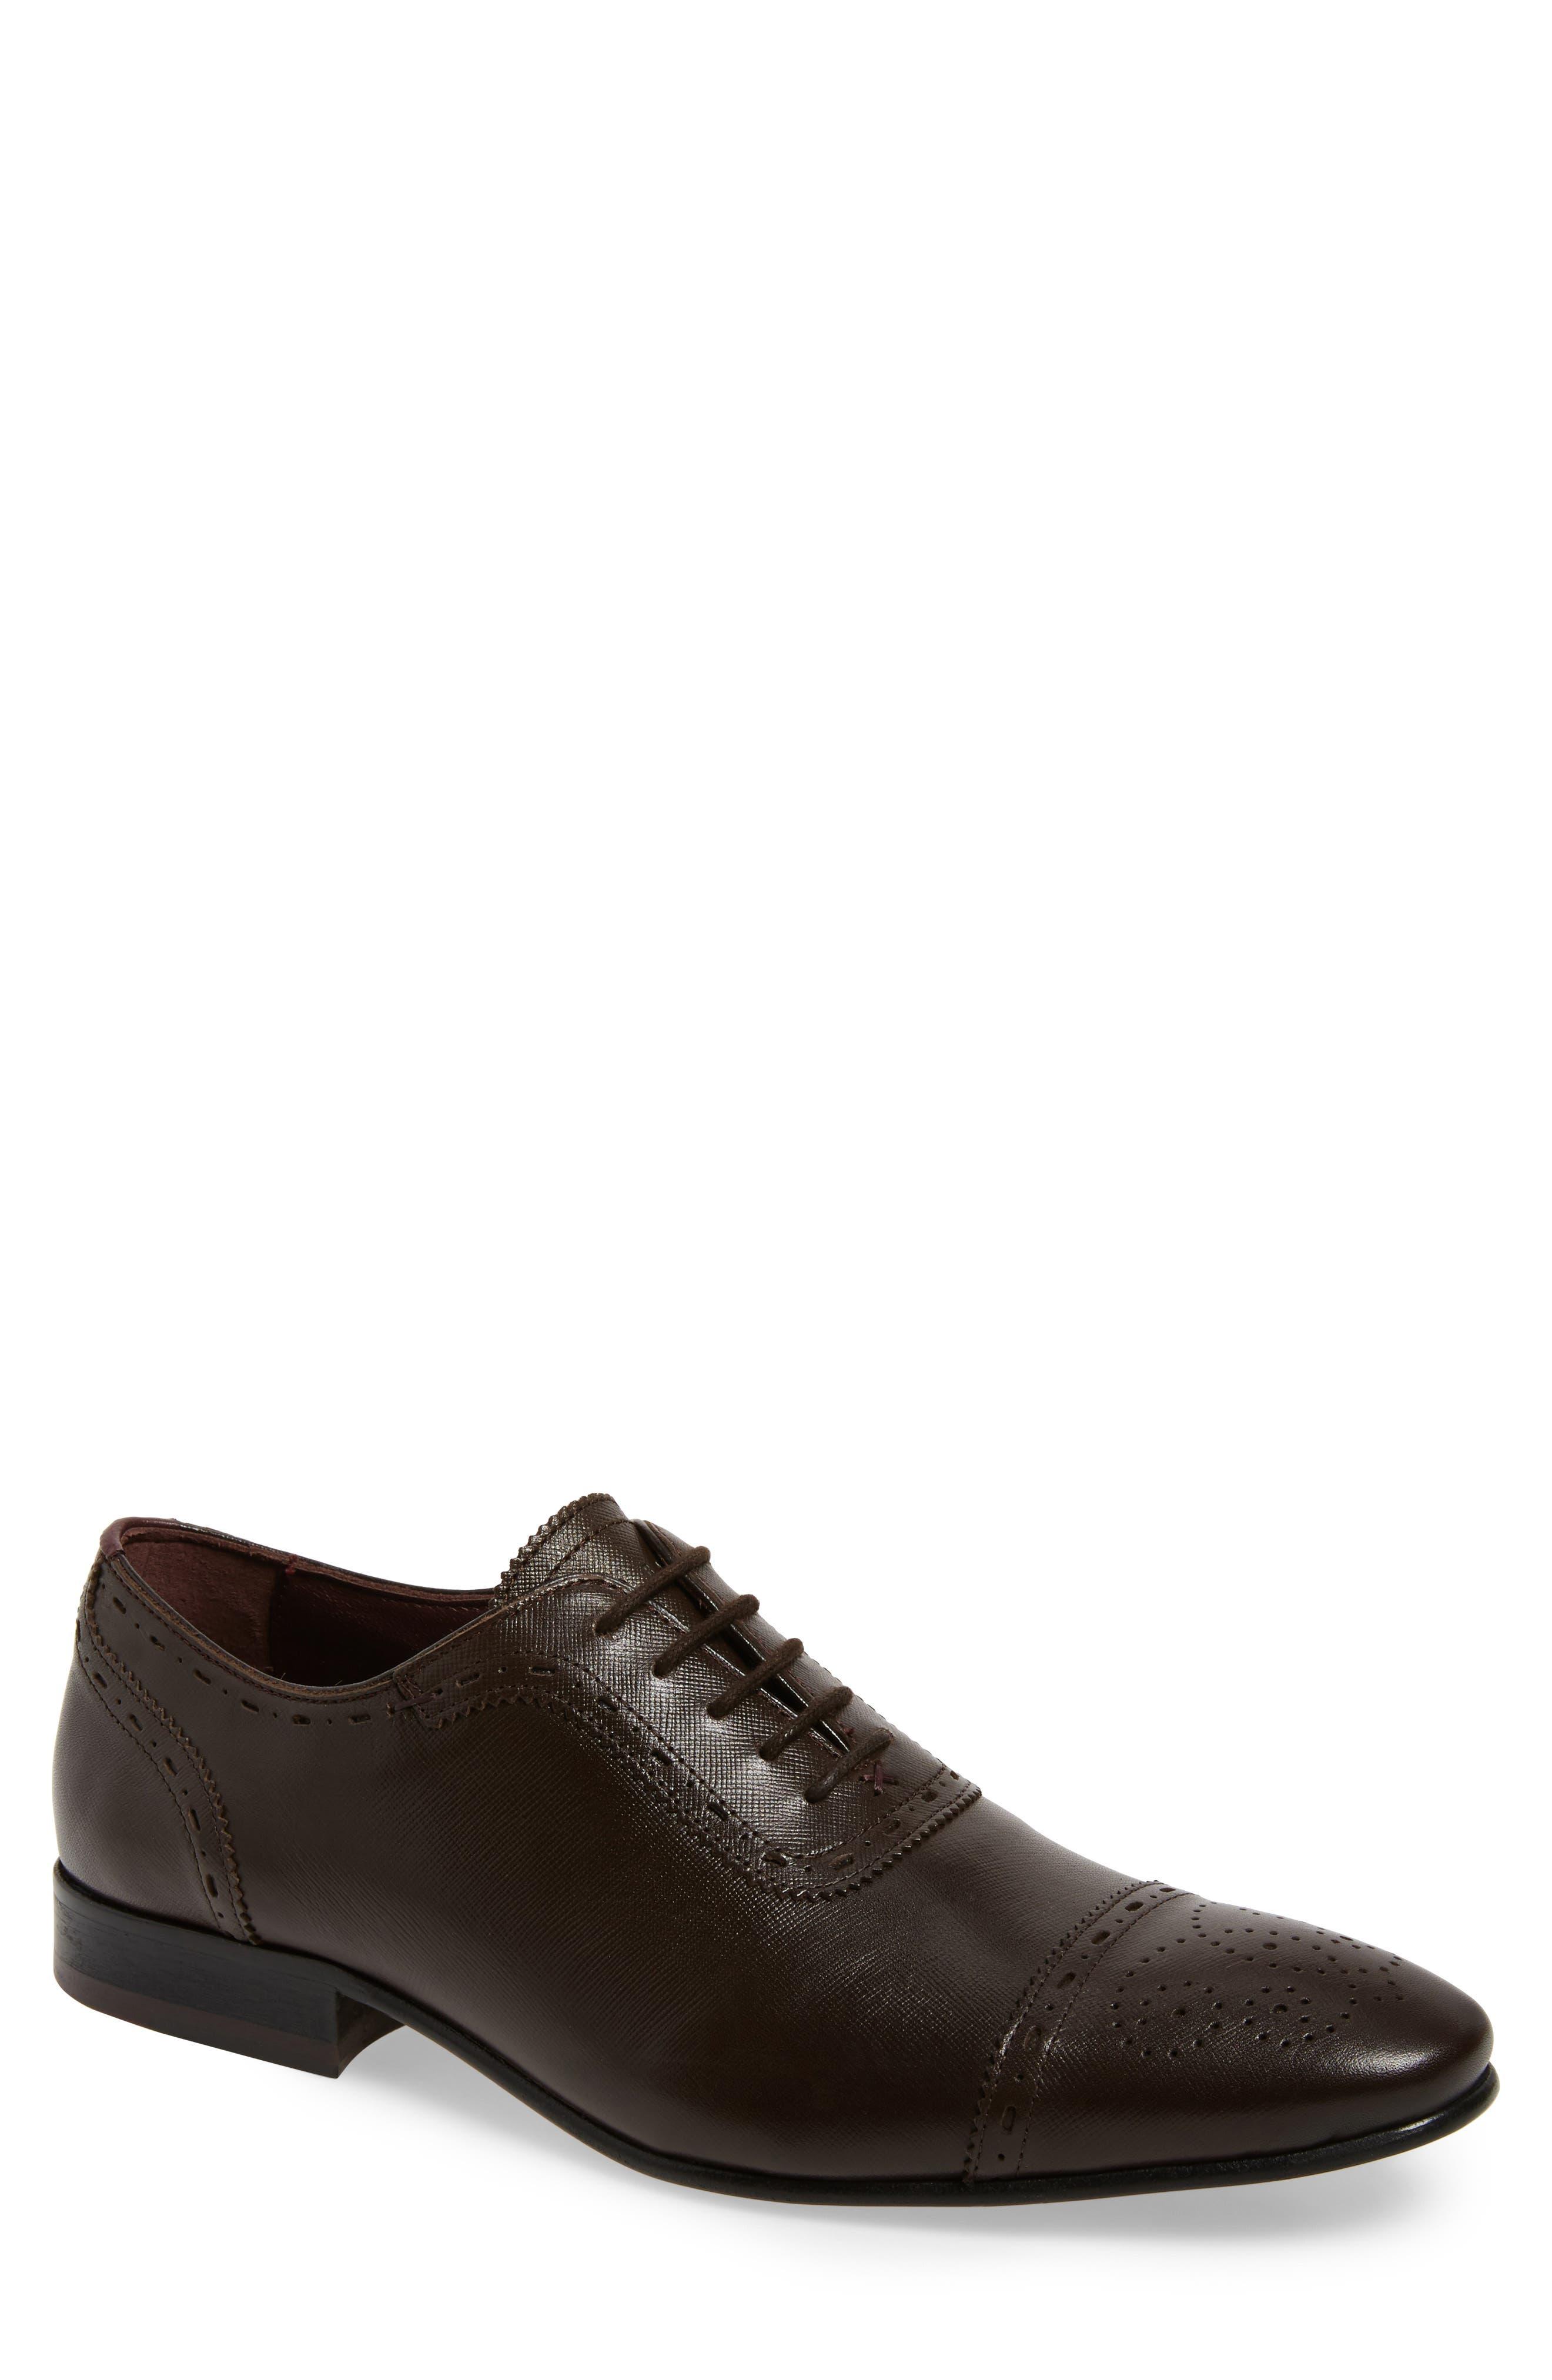 Barliy Cap Toe Oxford,                         Main,                         color, Brown Leather